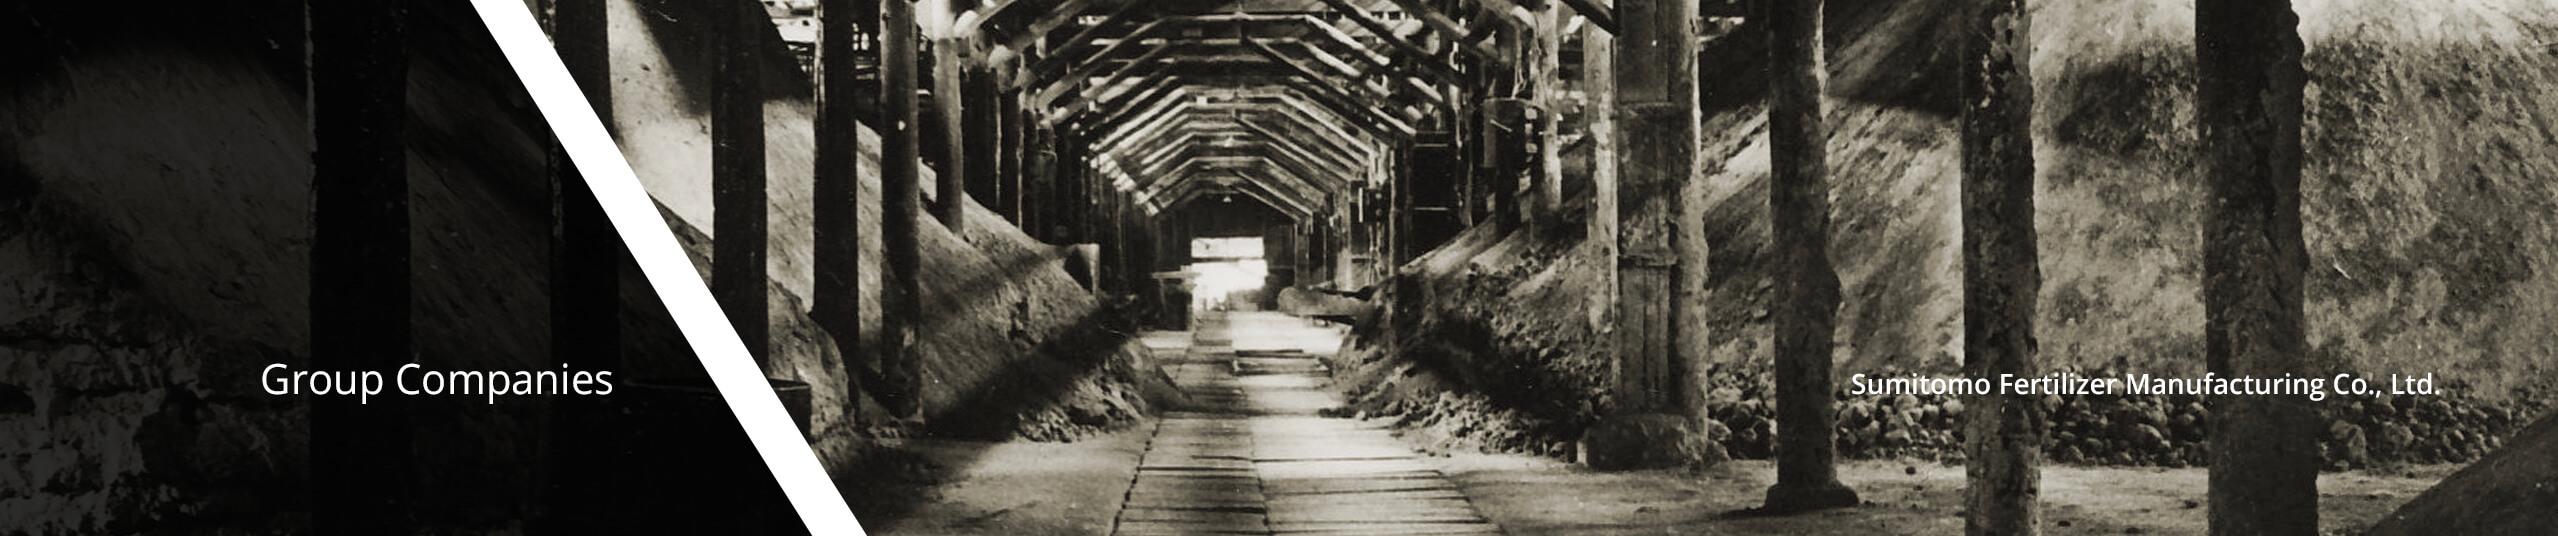 Historical photo of Sumitomo Fertilizer Manufacturing factory